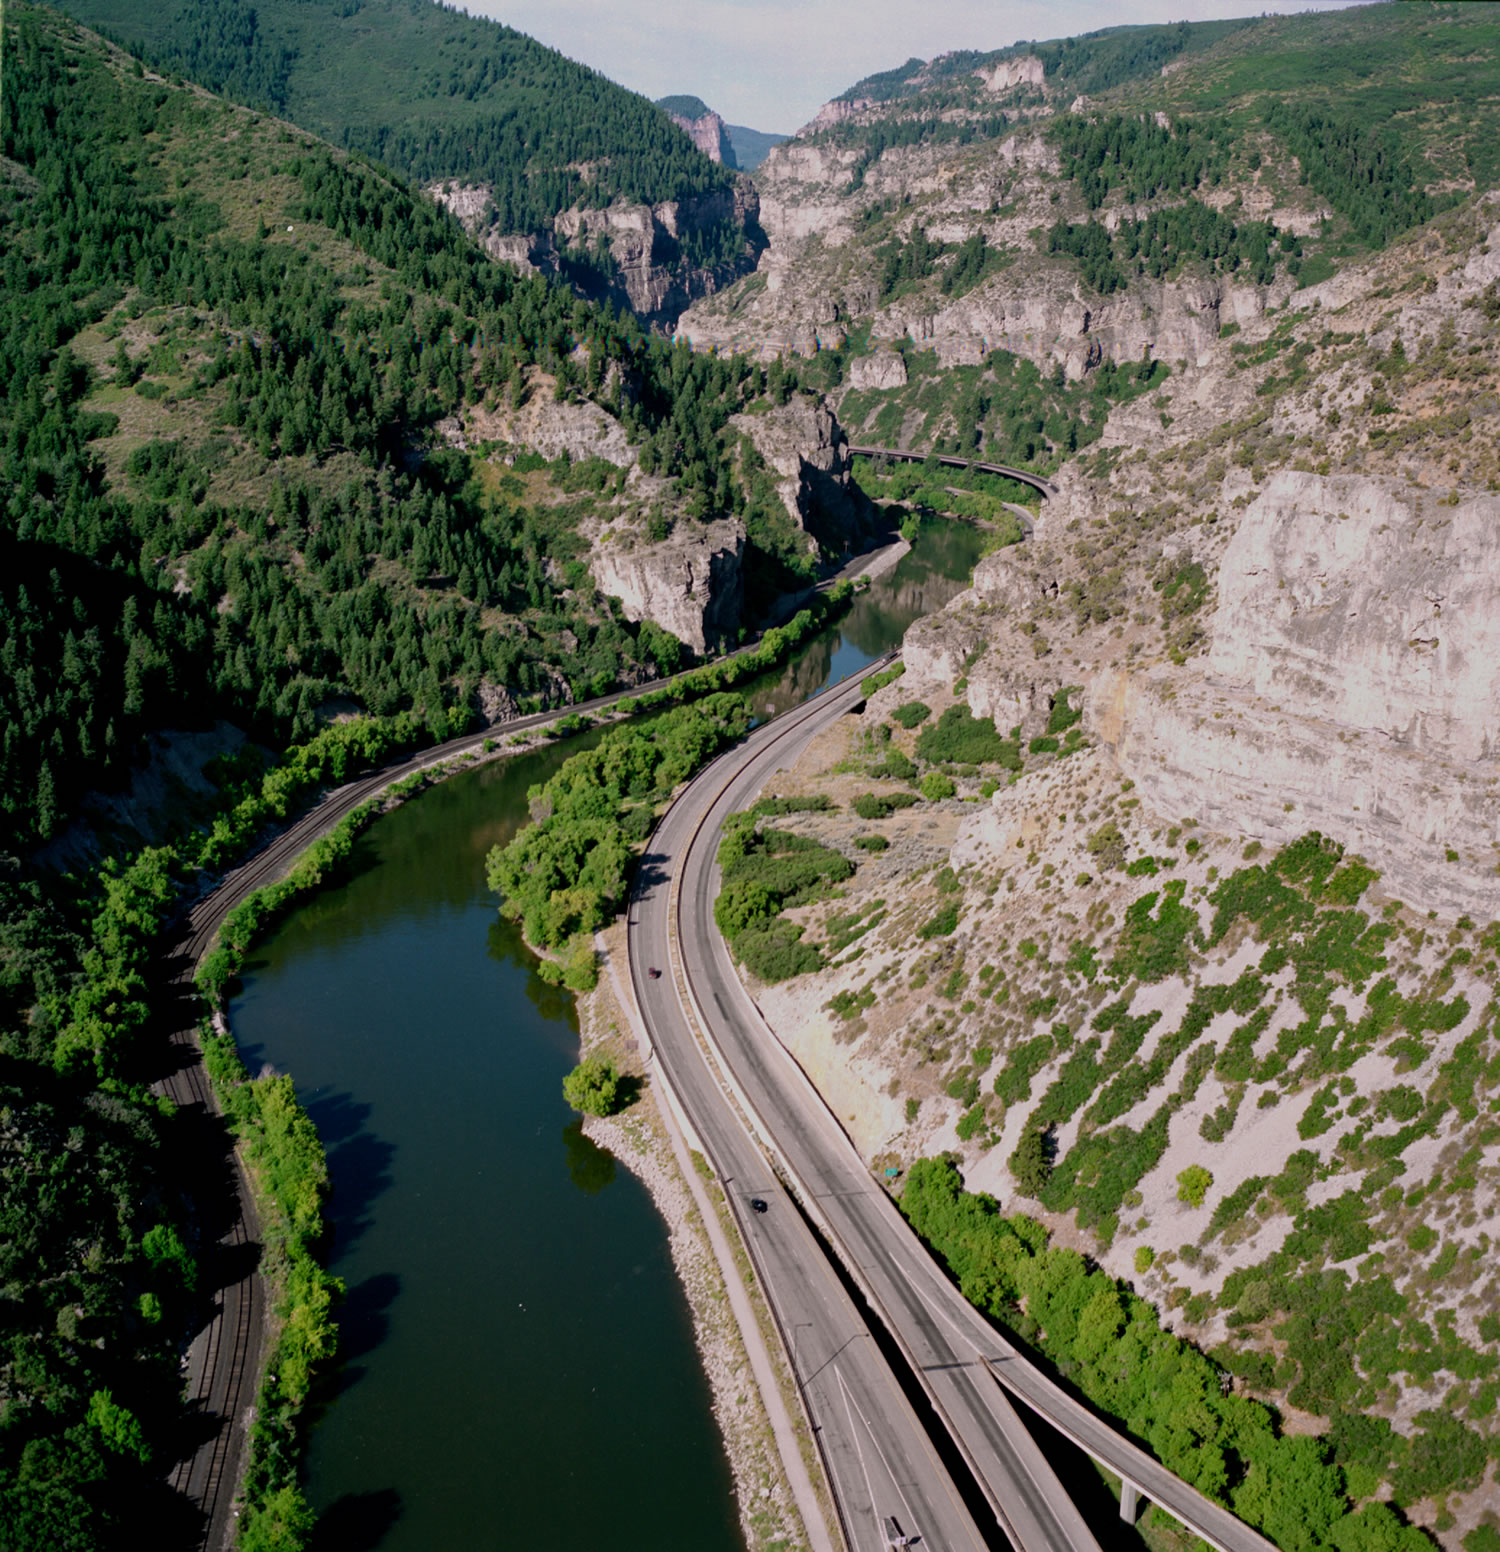 Glenwood Canyon detail image